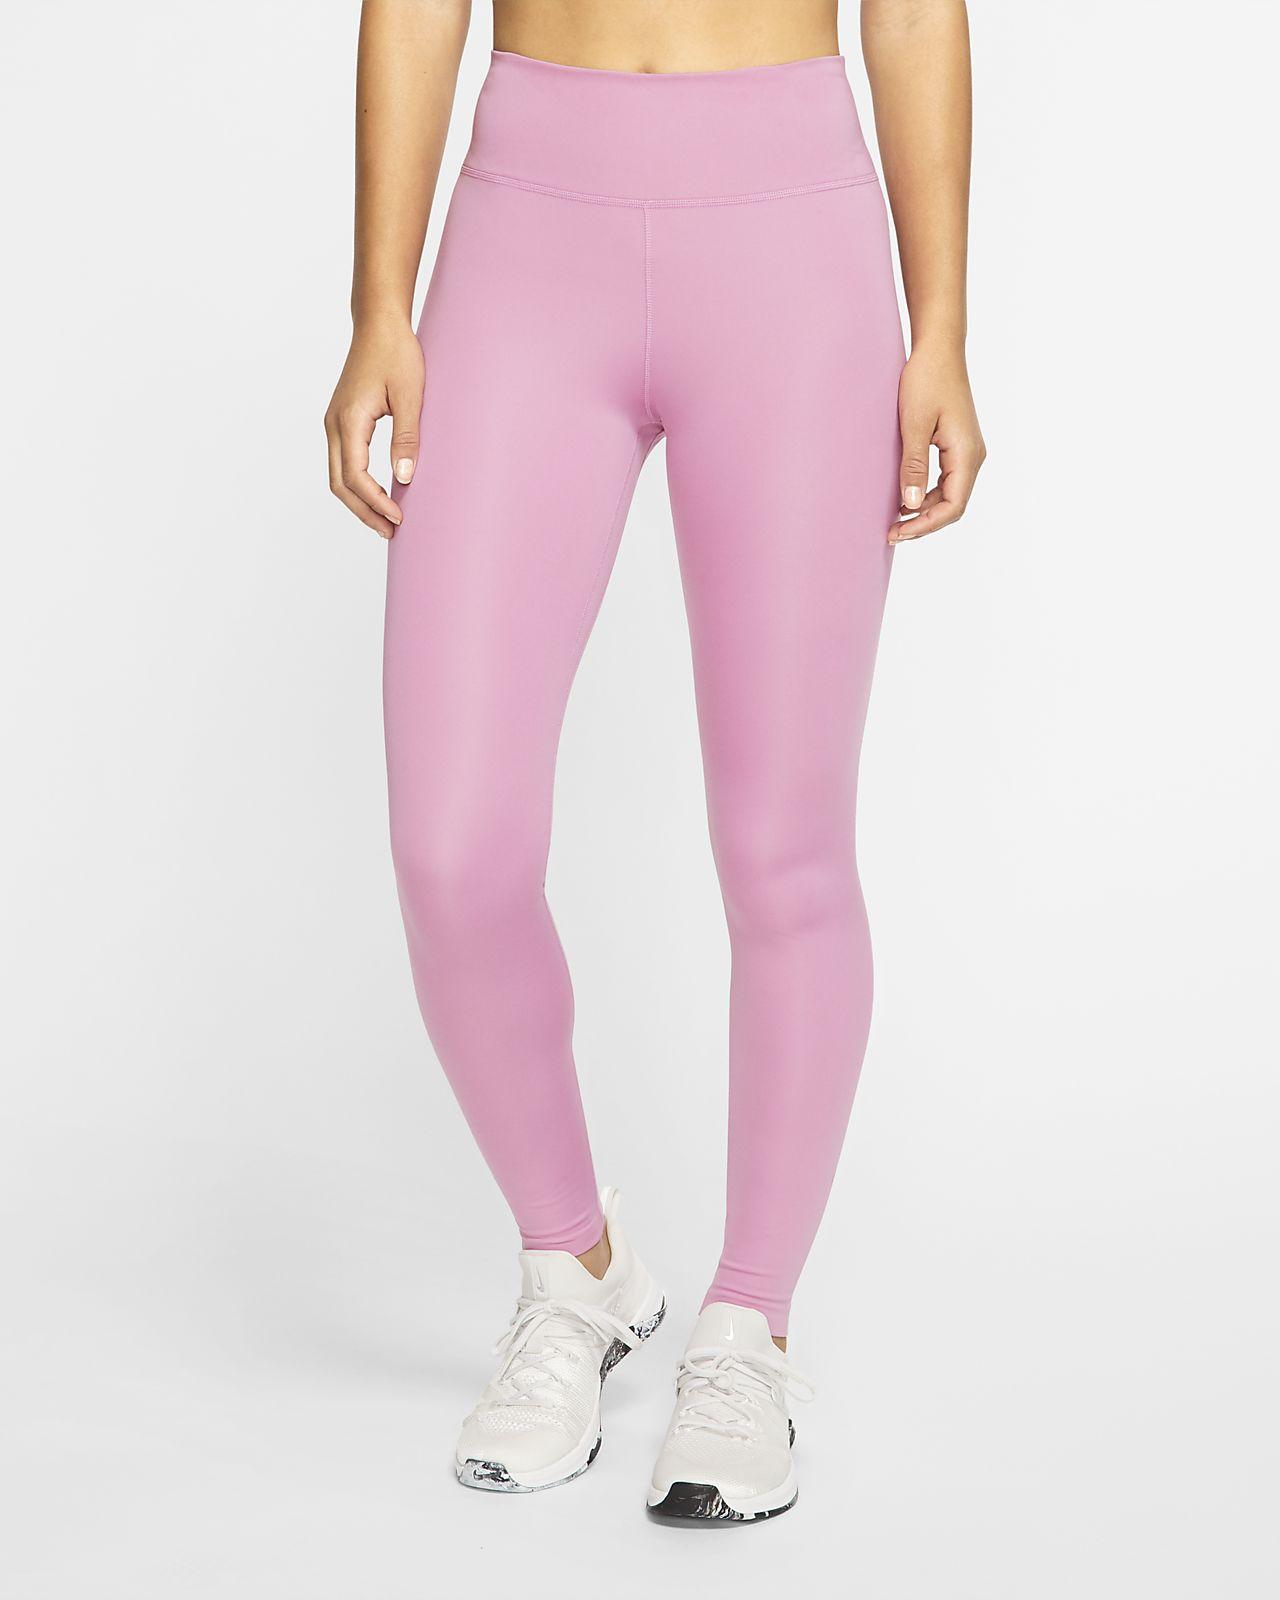 Attractive Deep Royal Blue Sail Nike Women's Pants Pants Gym